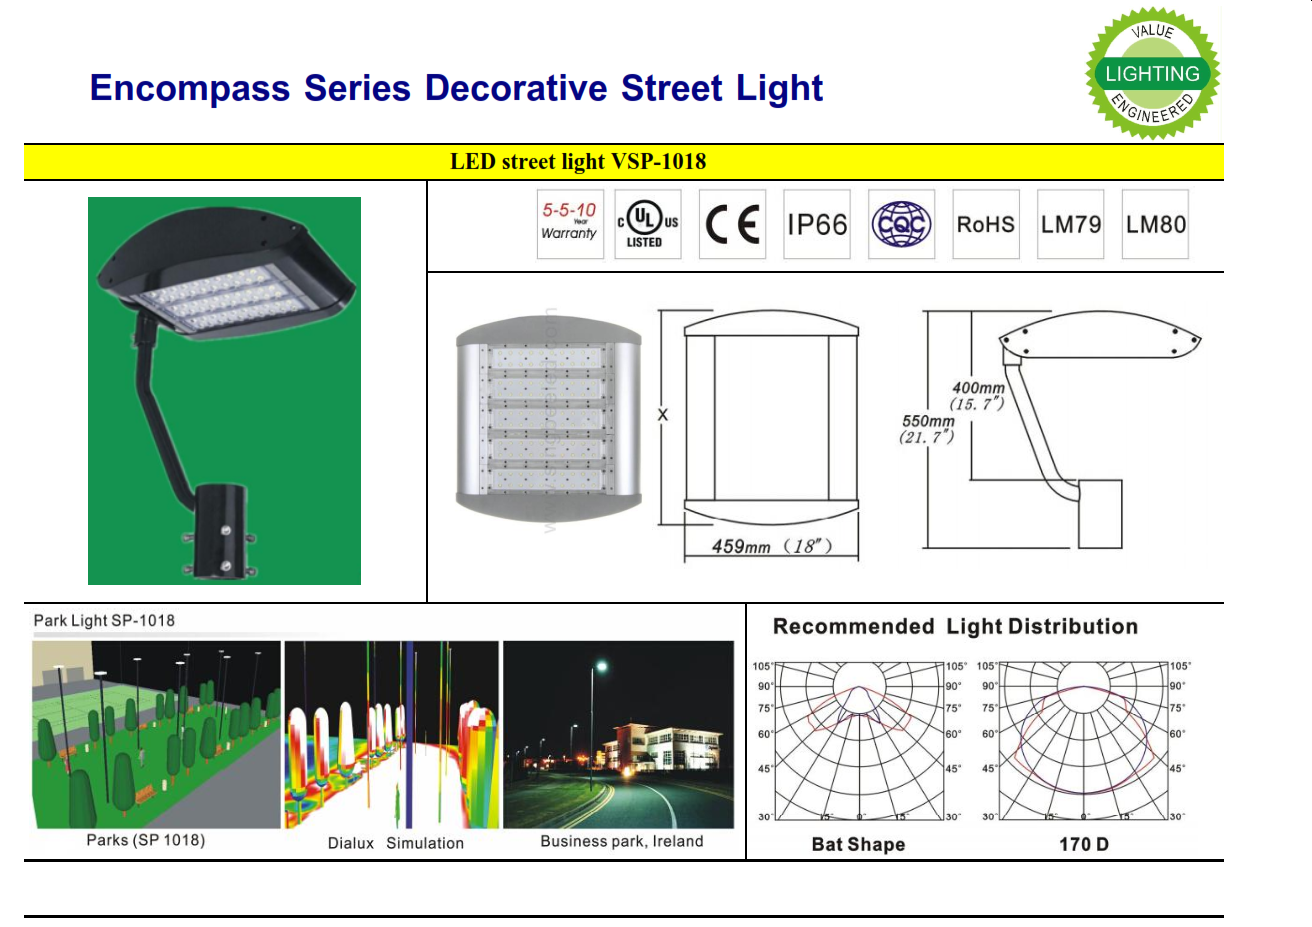 encompass-1-dec-street-light-cat-1.png